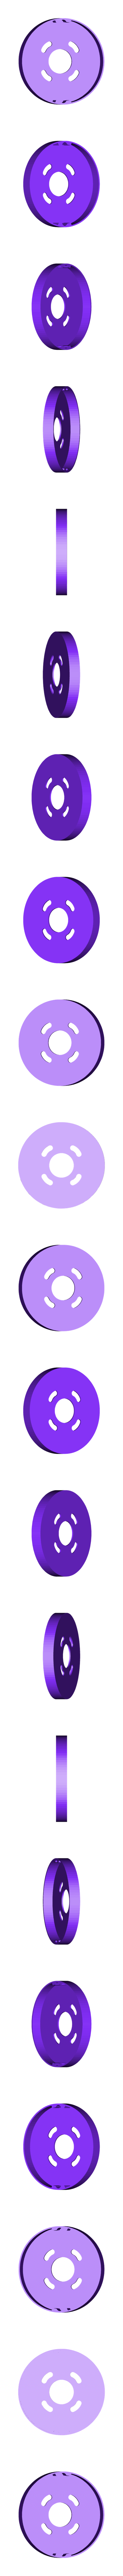 bigmac-holder.stl Download free STL file Circuit Playground Sound Box • 3D printable object, Adafruit